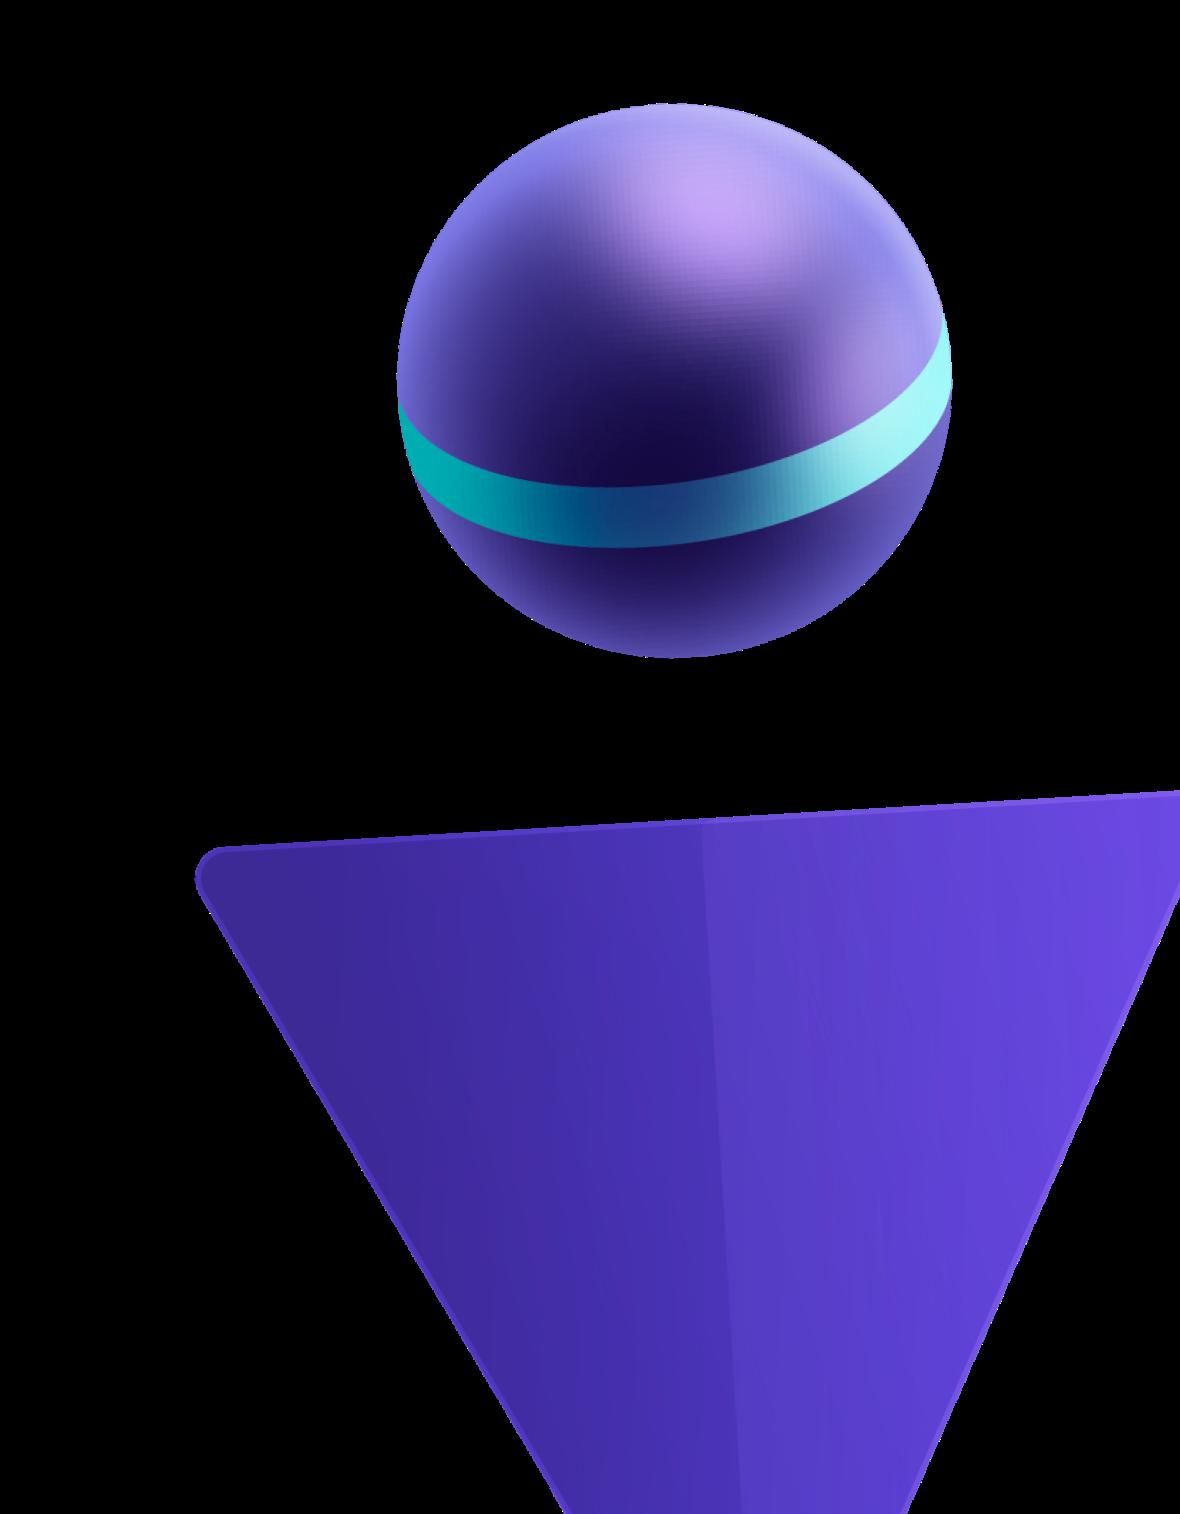 Geometric person